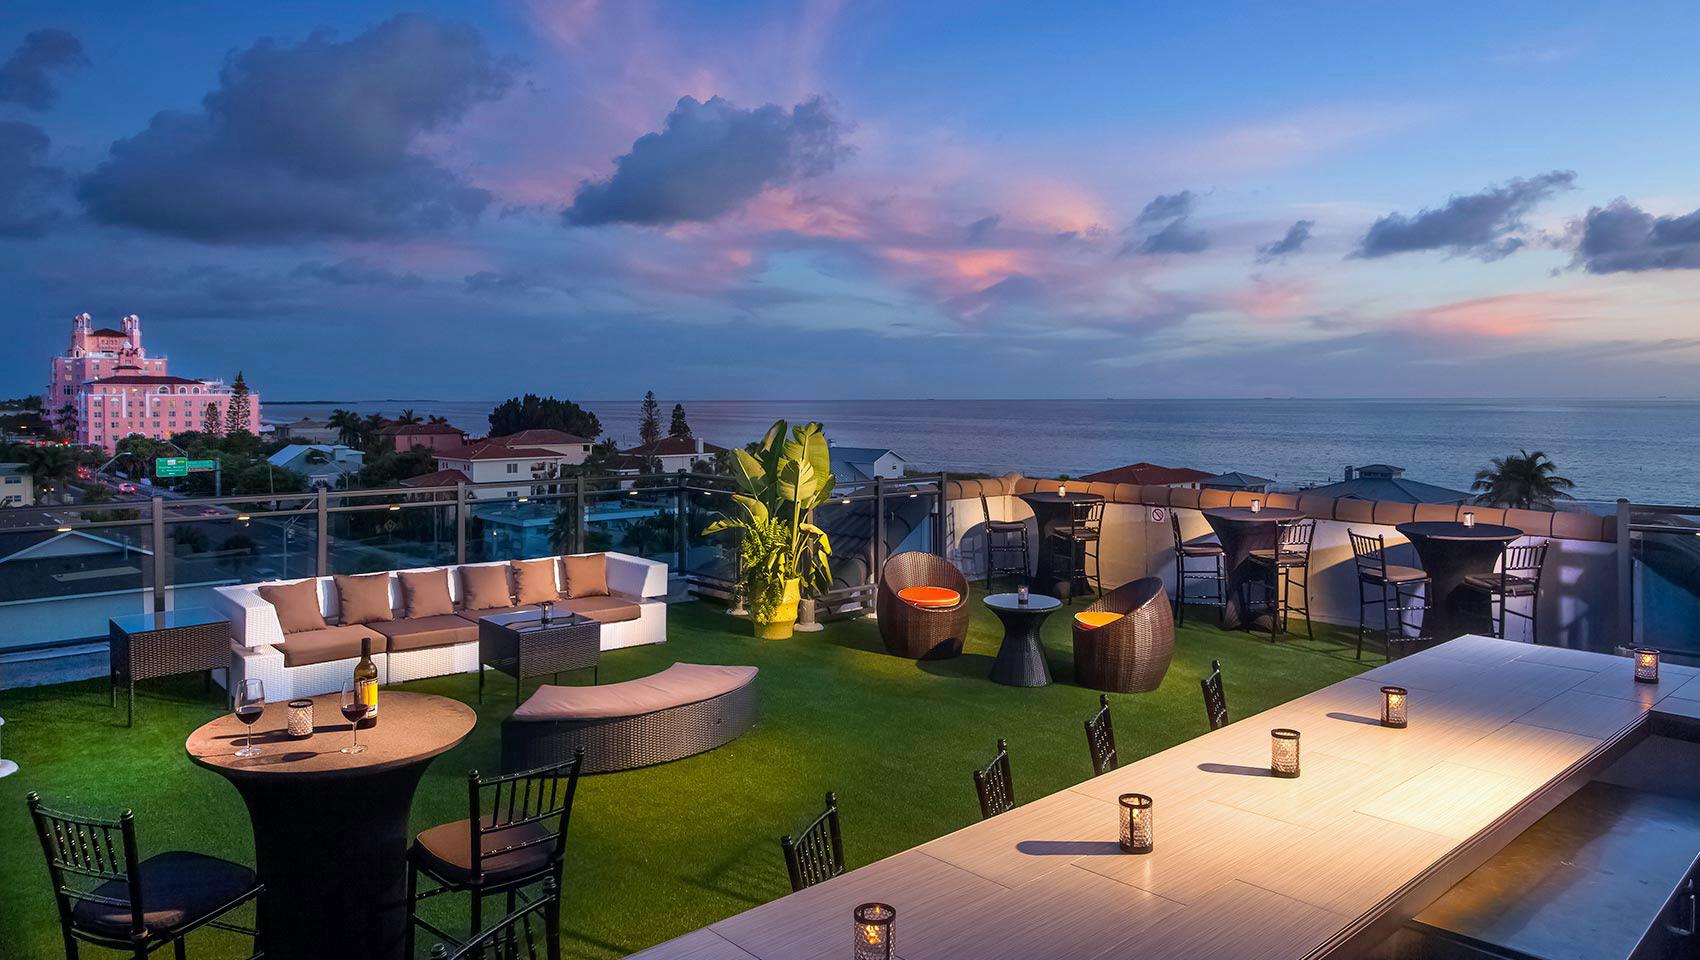 360 Rooftop at Hotel Zamora / Castile Restaurant